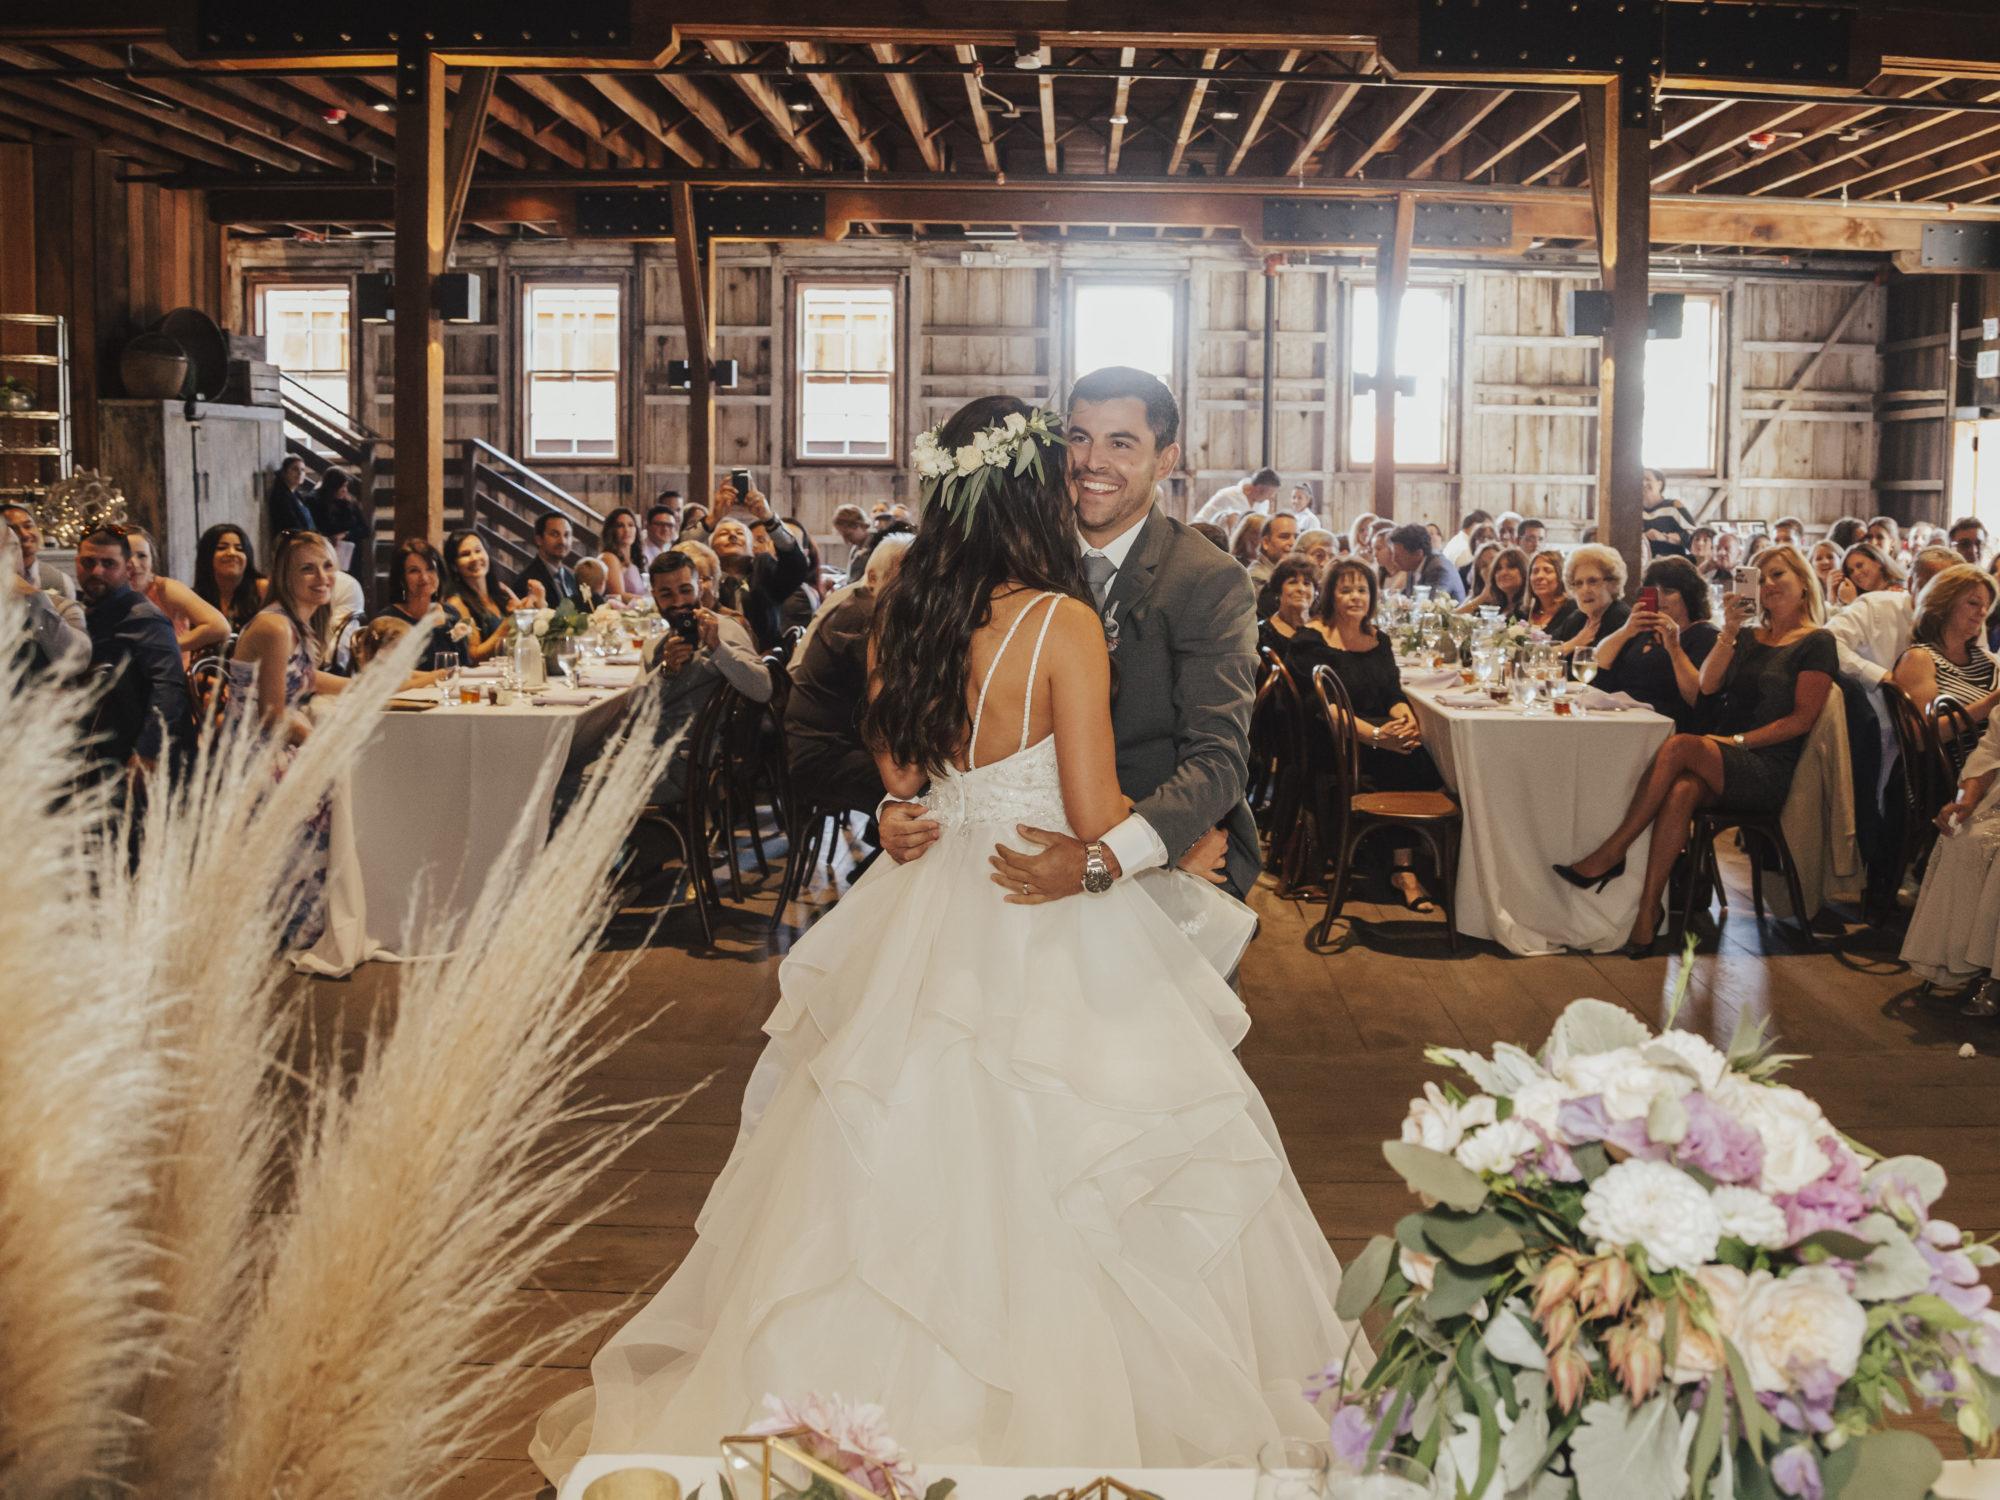 First Wedding Dance inside The Barns at Cooper Molera